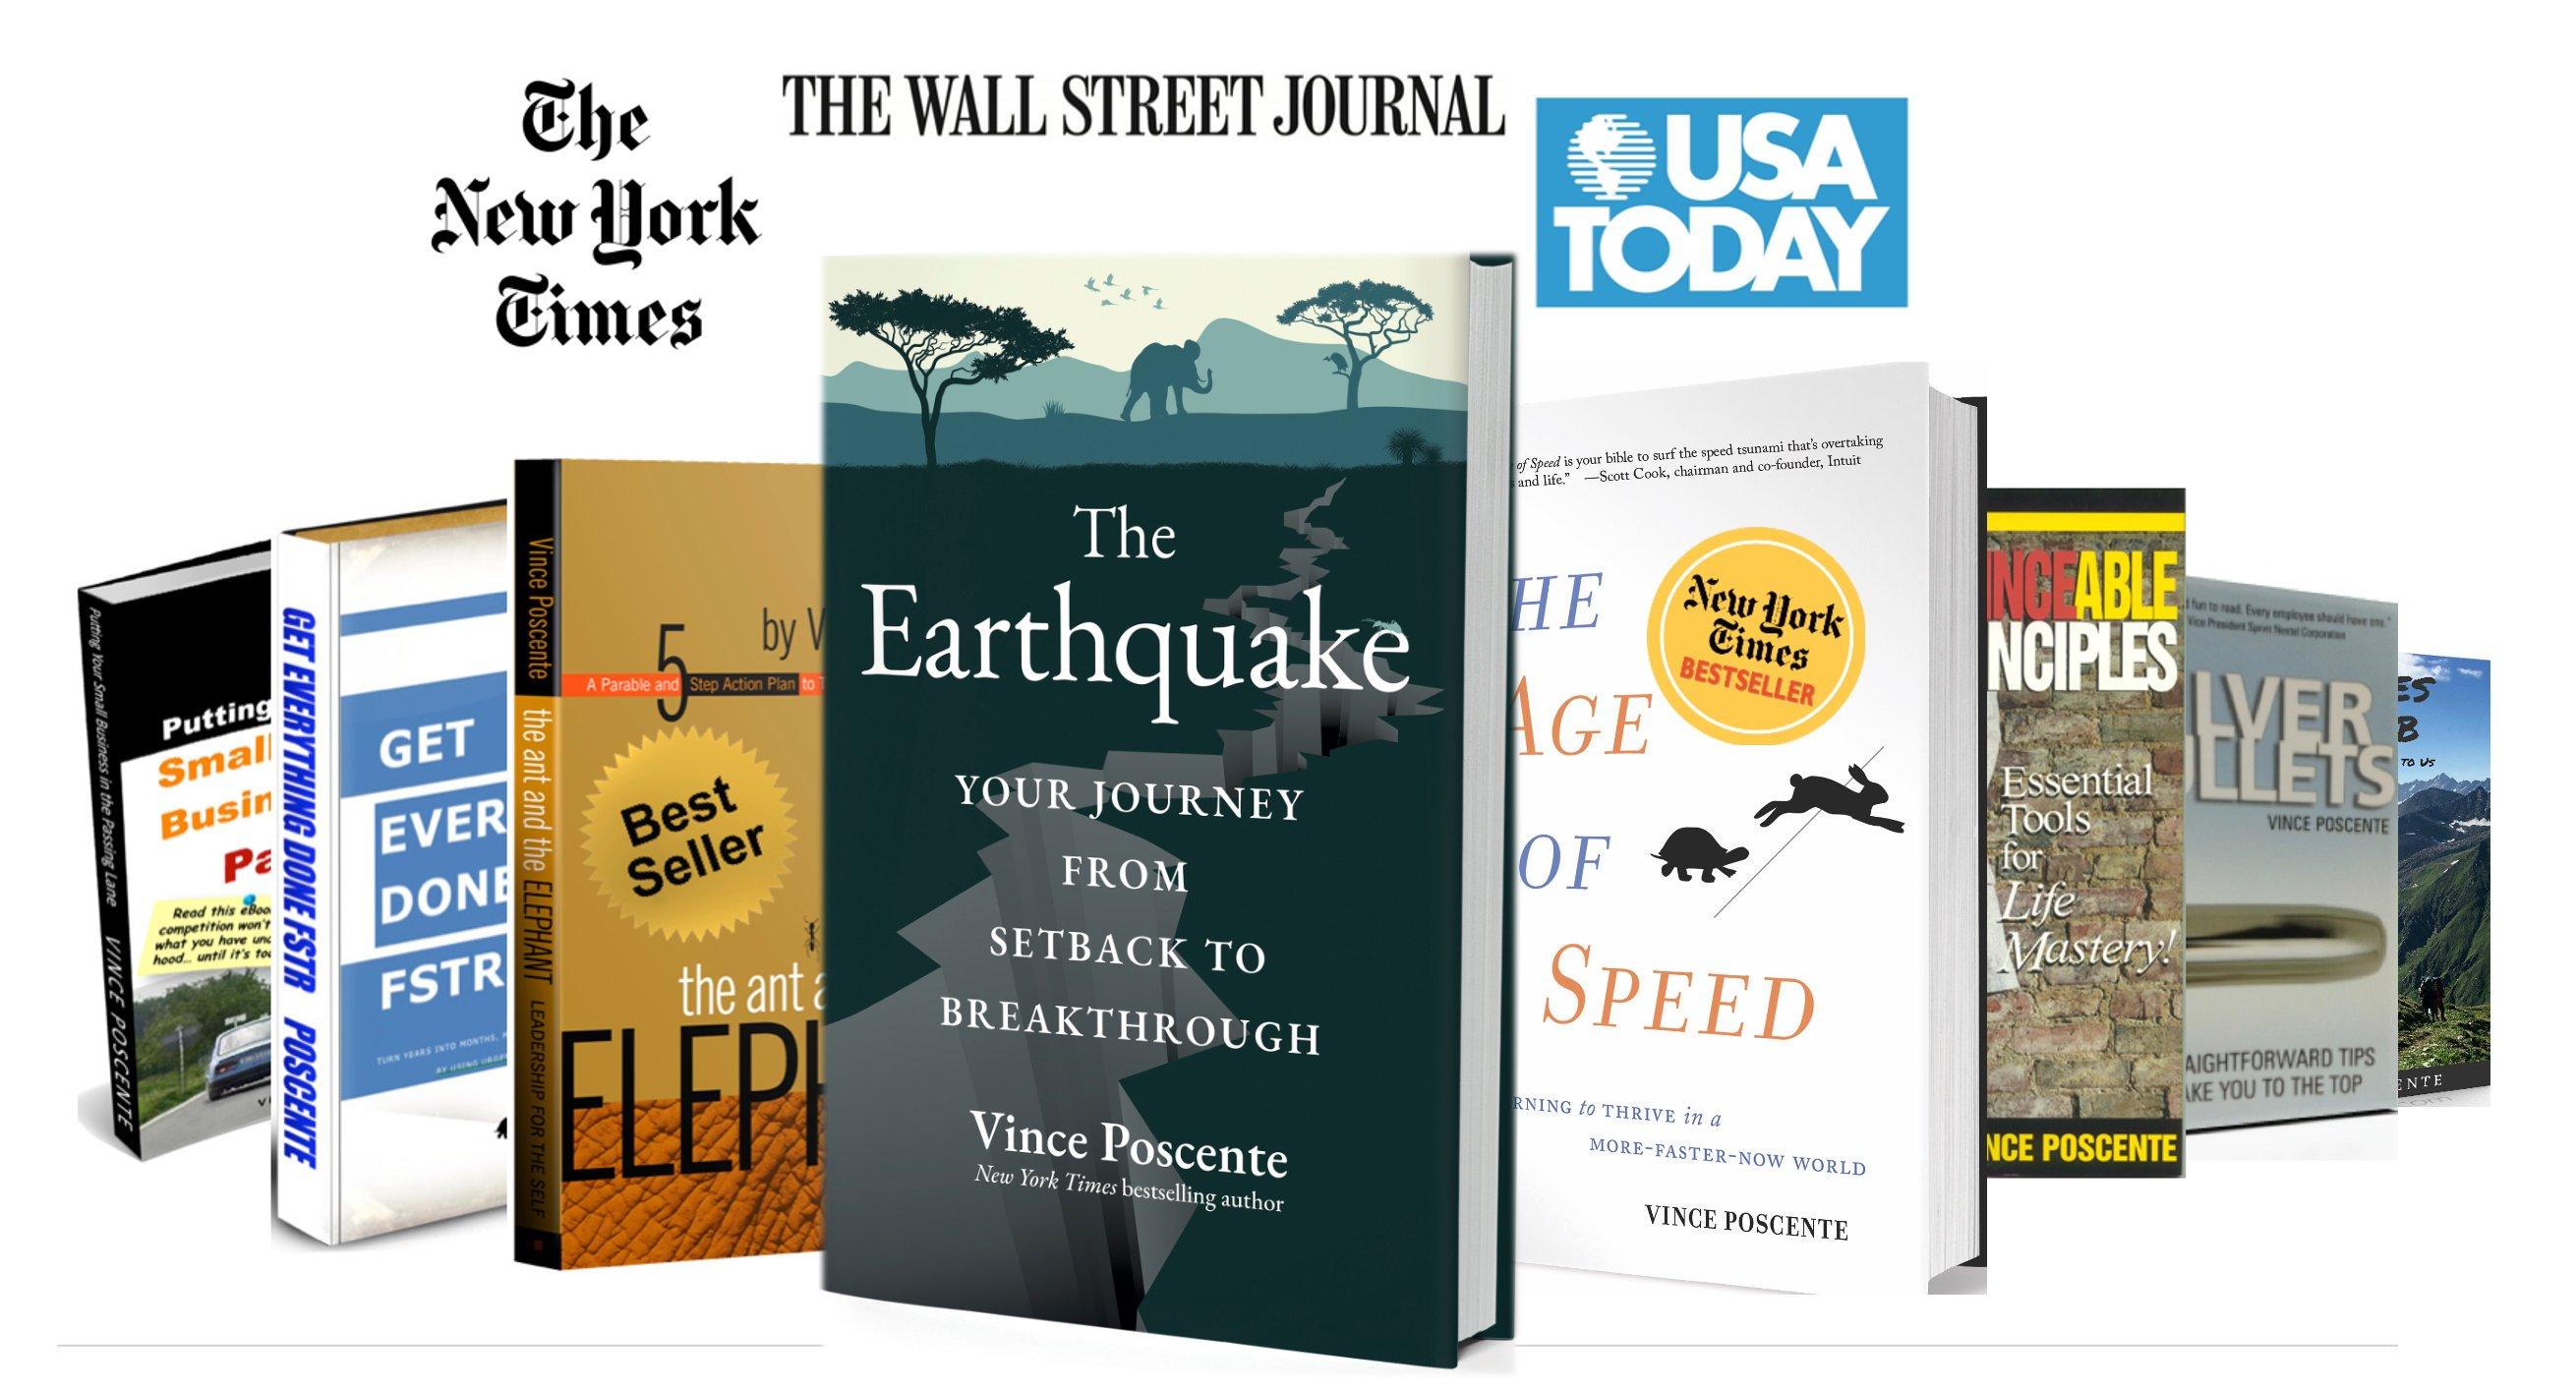 8 Books by Vince Poscente 2021 LoRes